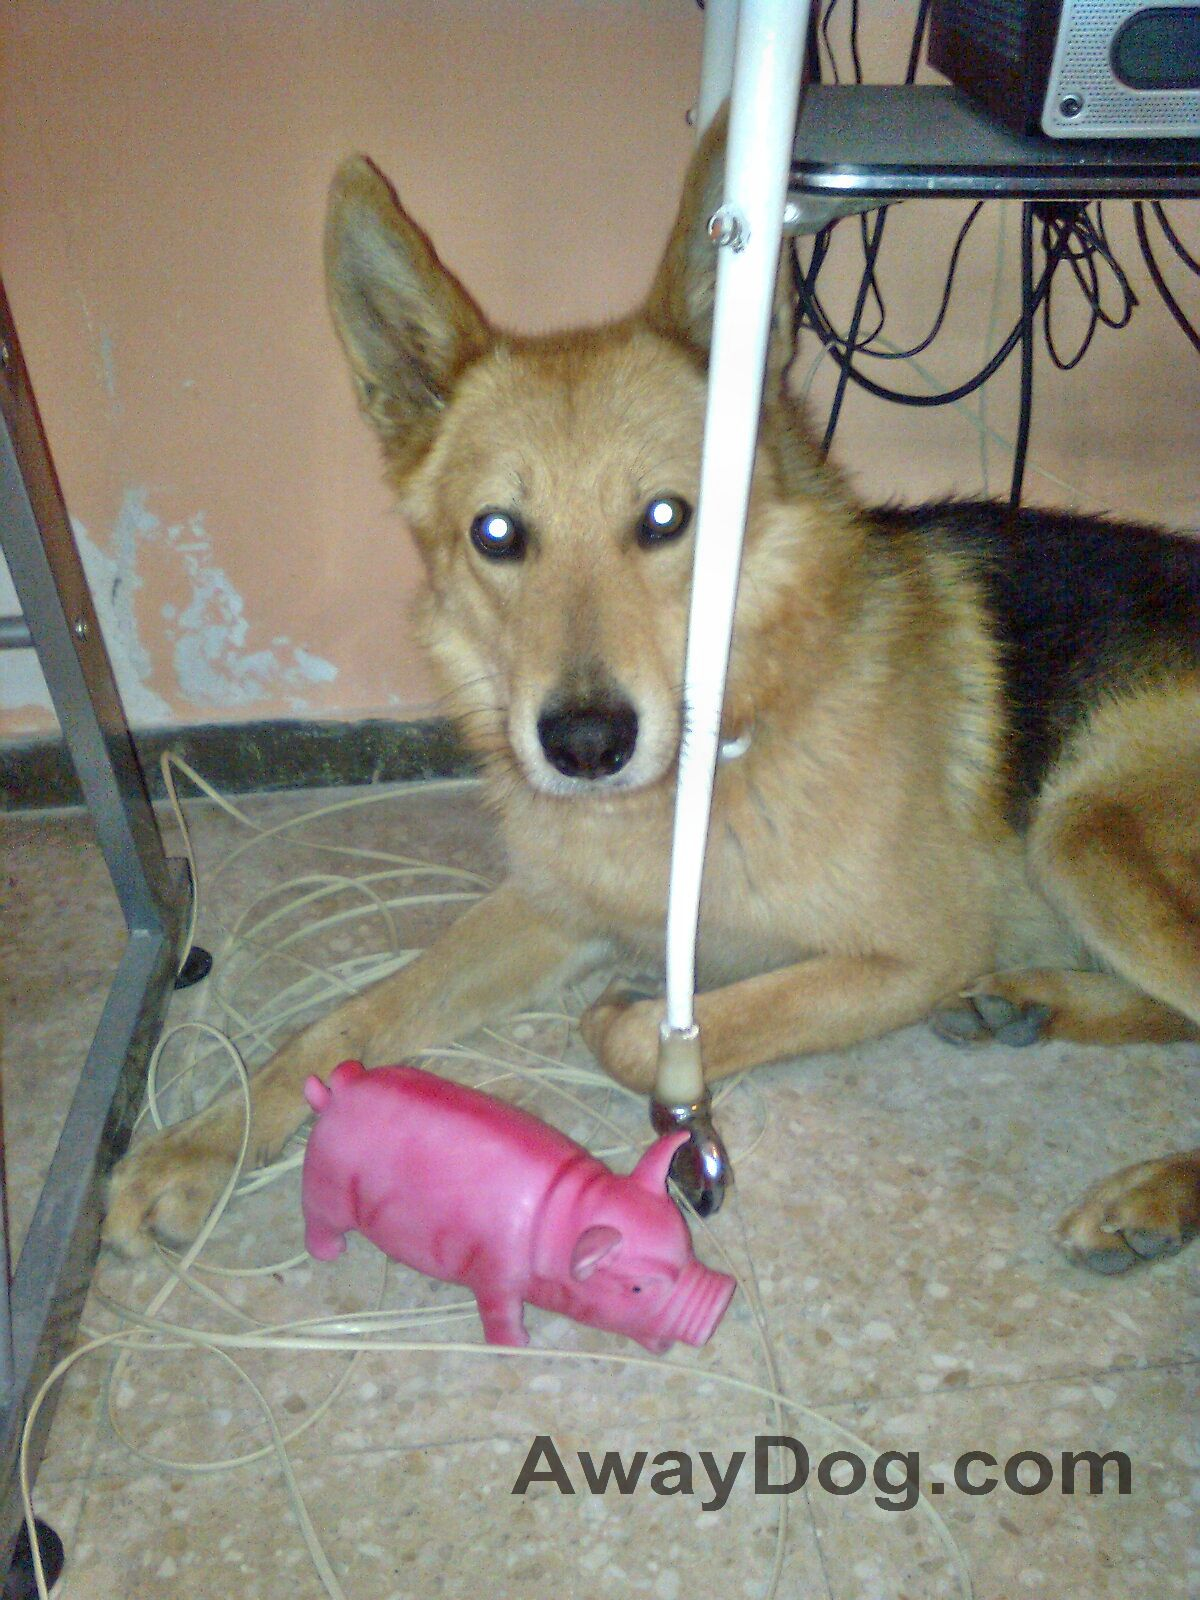 German Shepherd mutt with pink pig